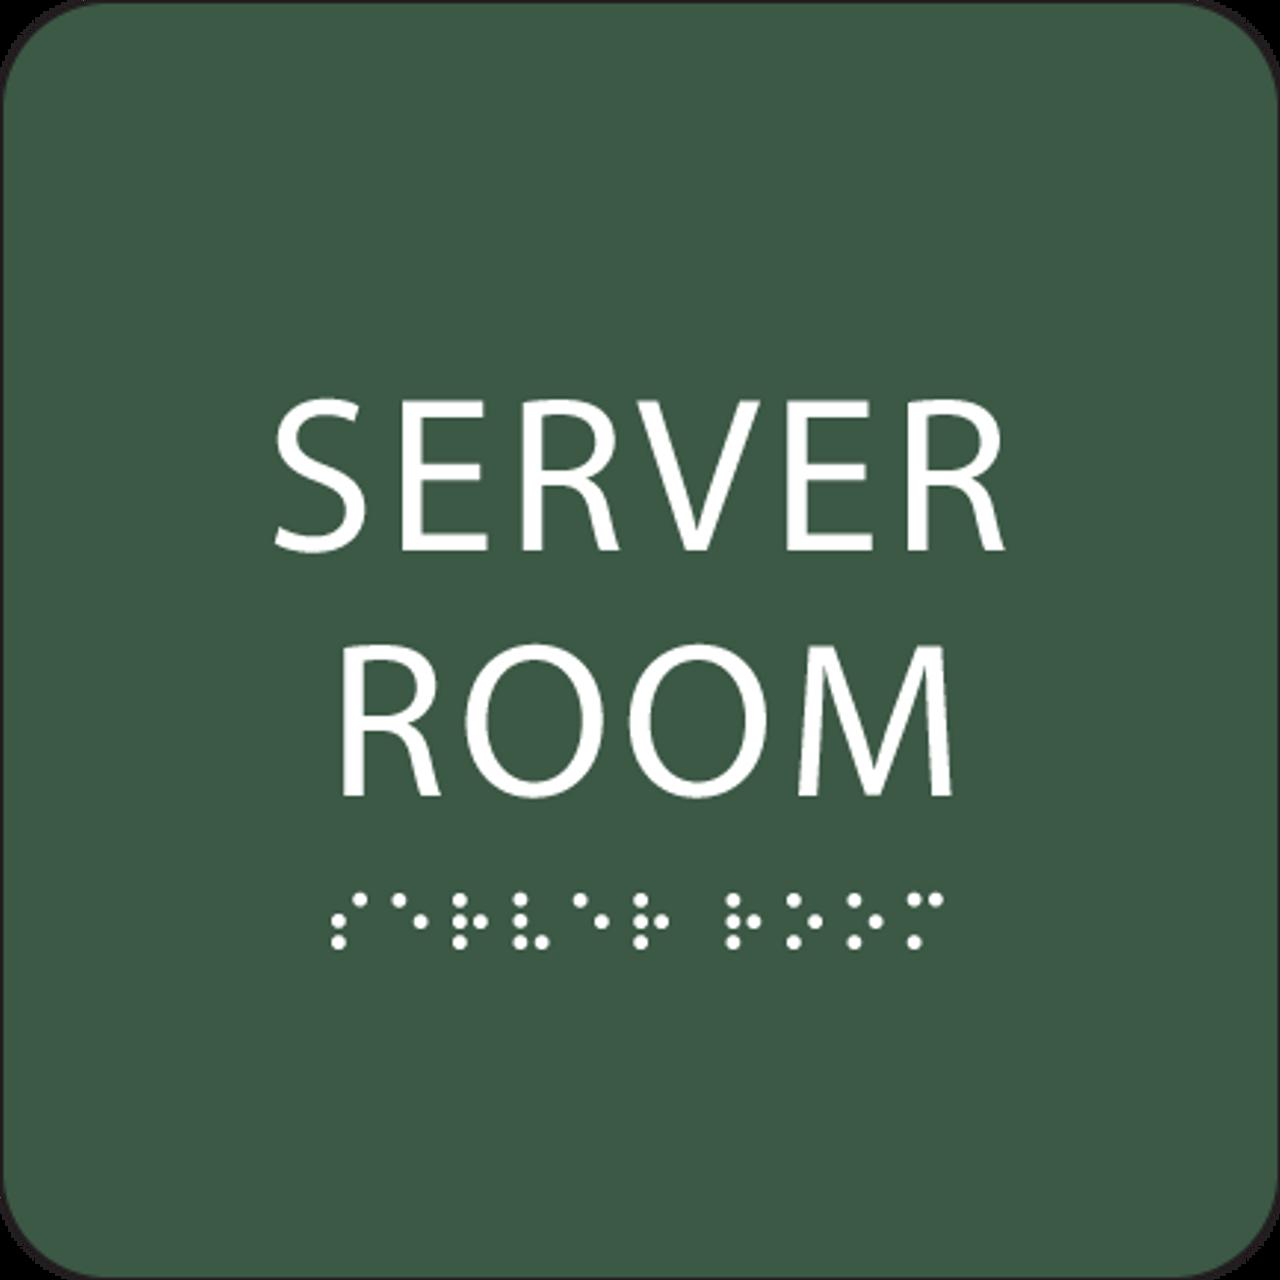 Green Server Room Tactile Sign